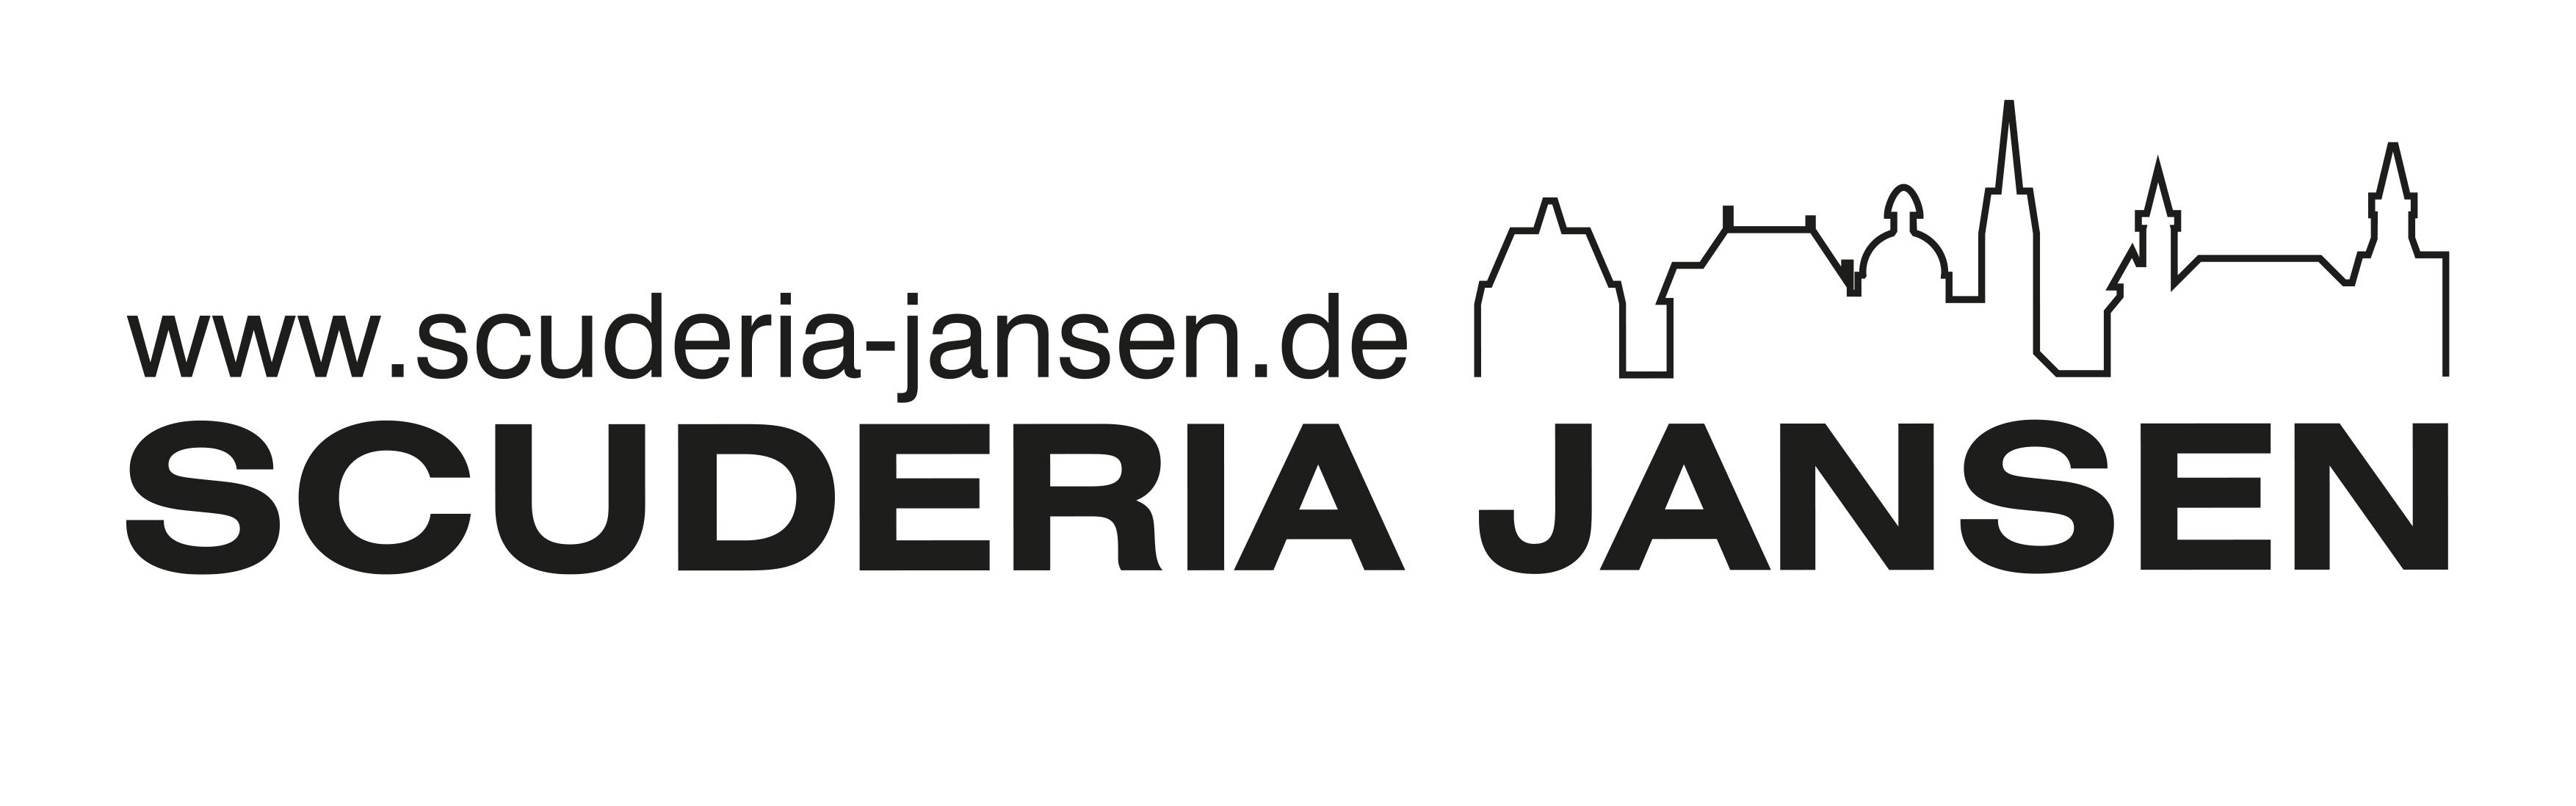 Scuderia_logo